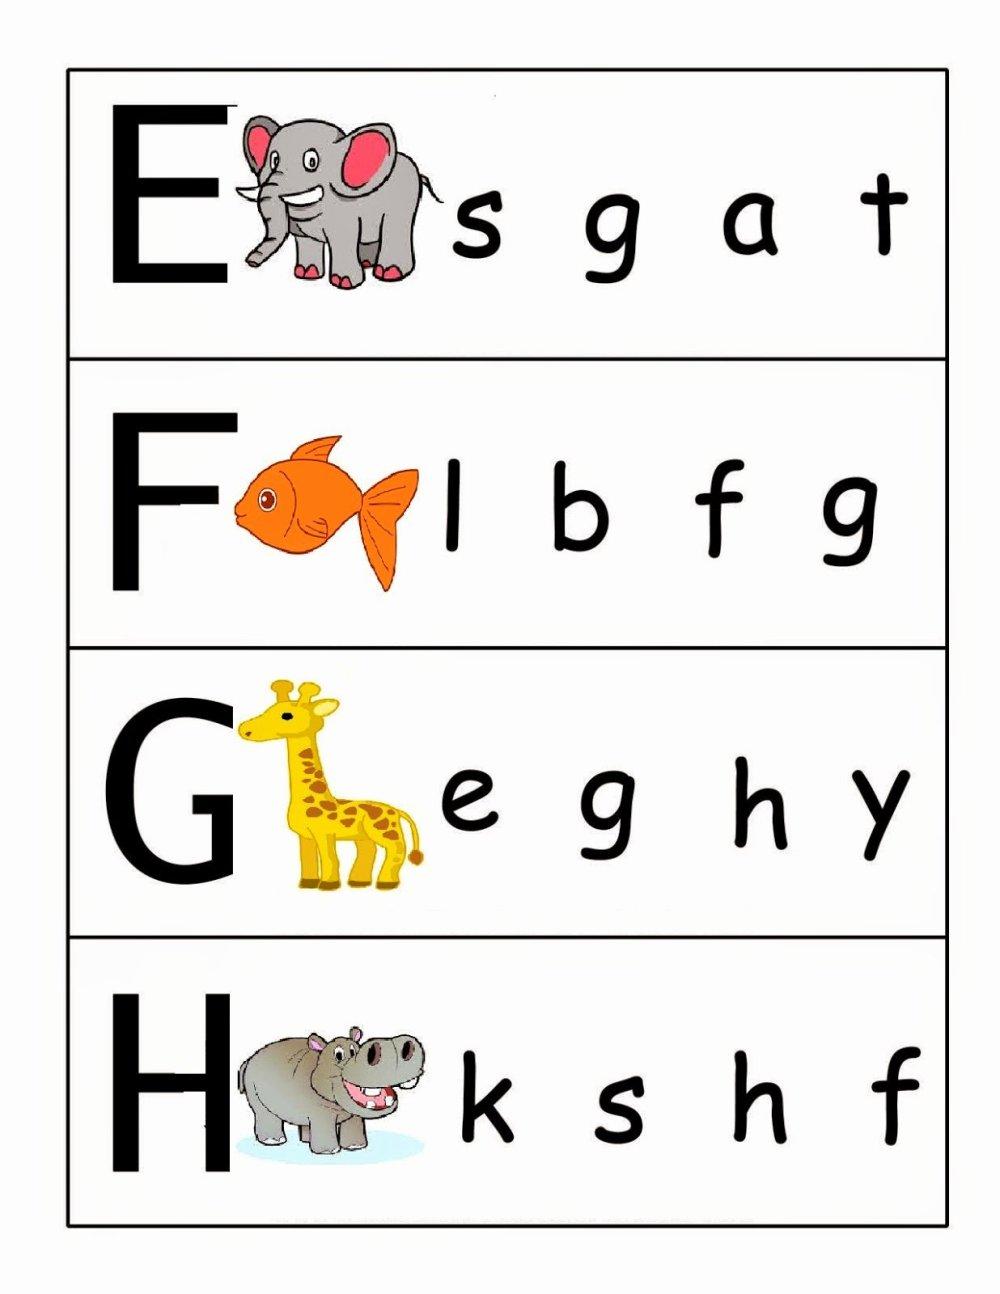 medium resolution of Lowercase Letters Worksheets for Preschoolers Fresh Kindergarten Worksheets  Match Upper Case and Lower Case – Printable Worksheets for Kids